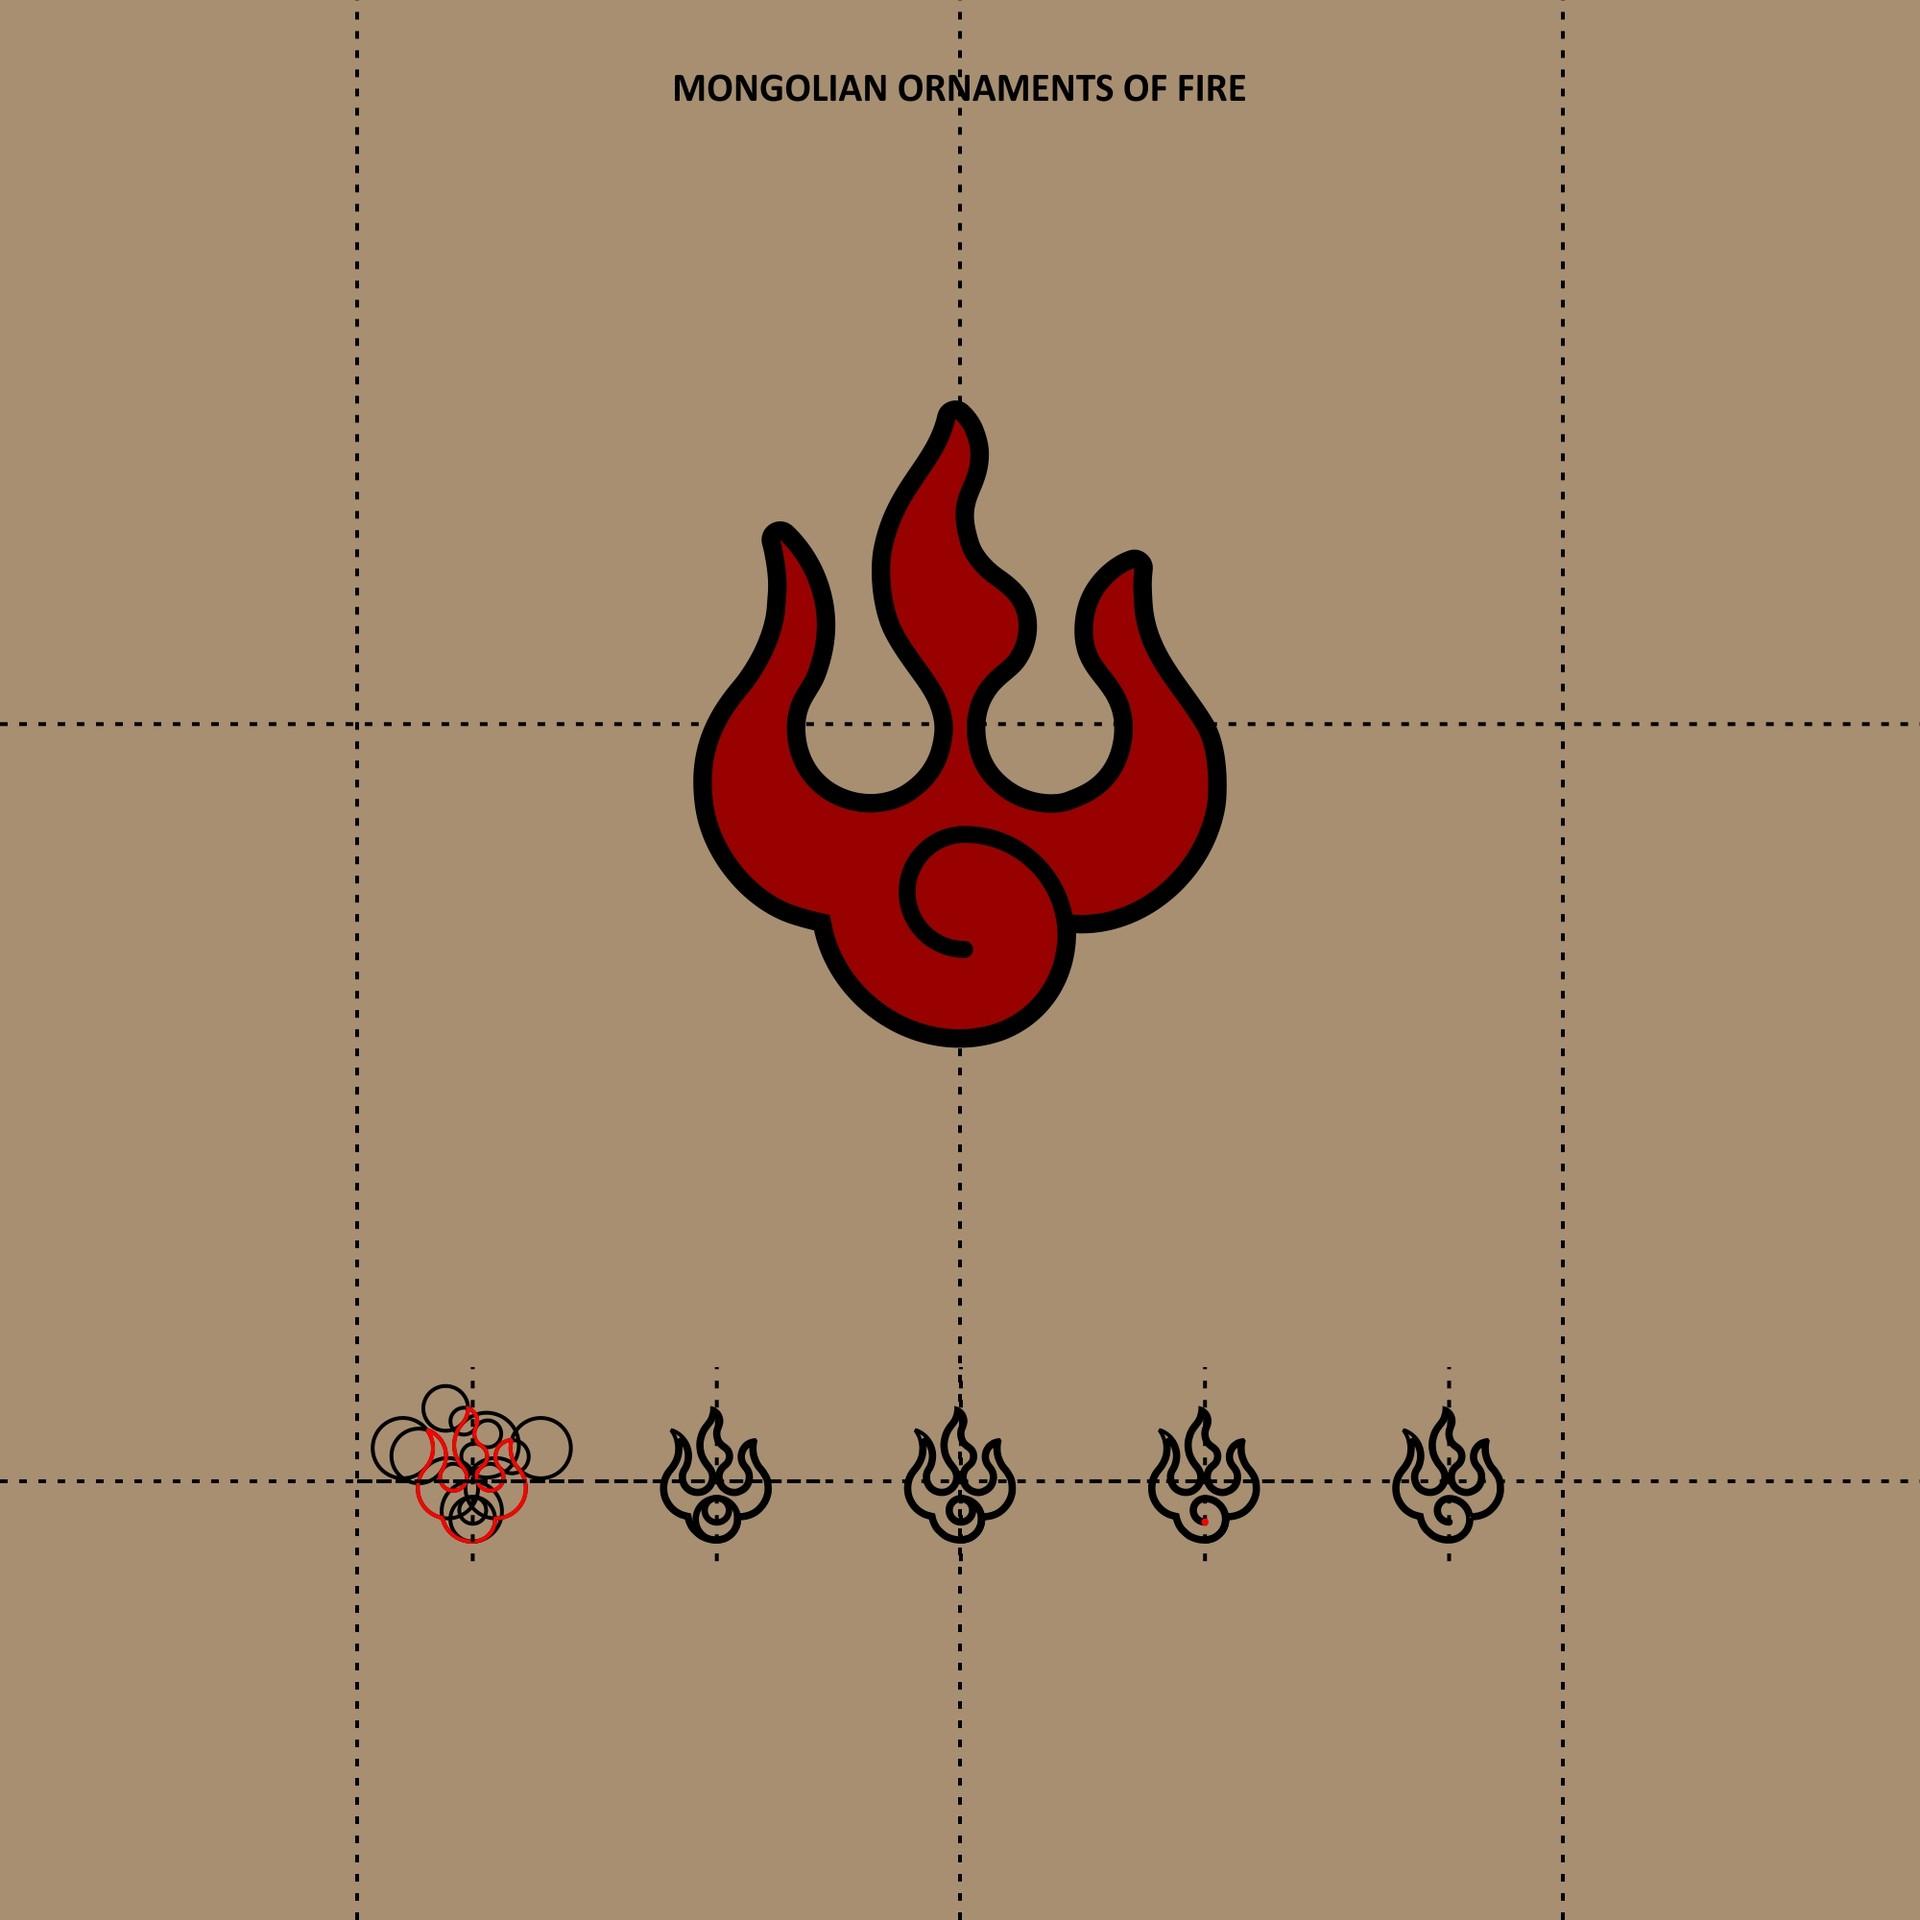 Mongolian ornament fire